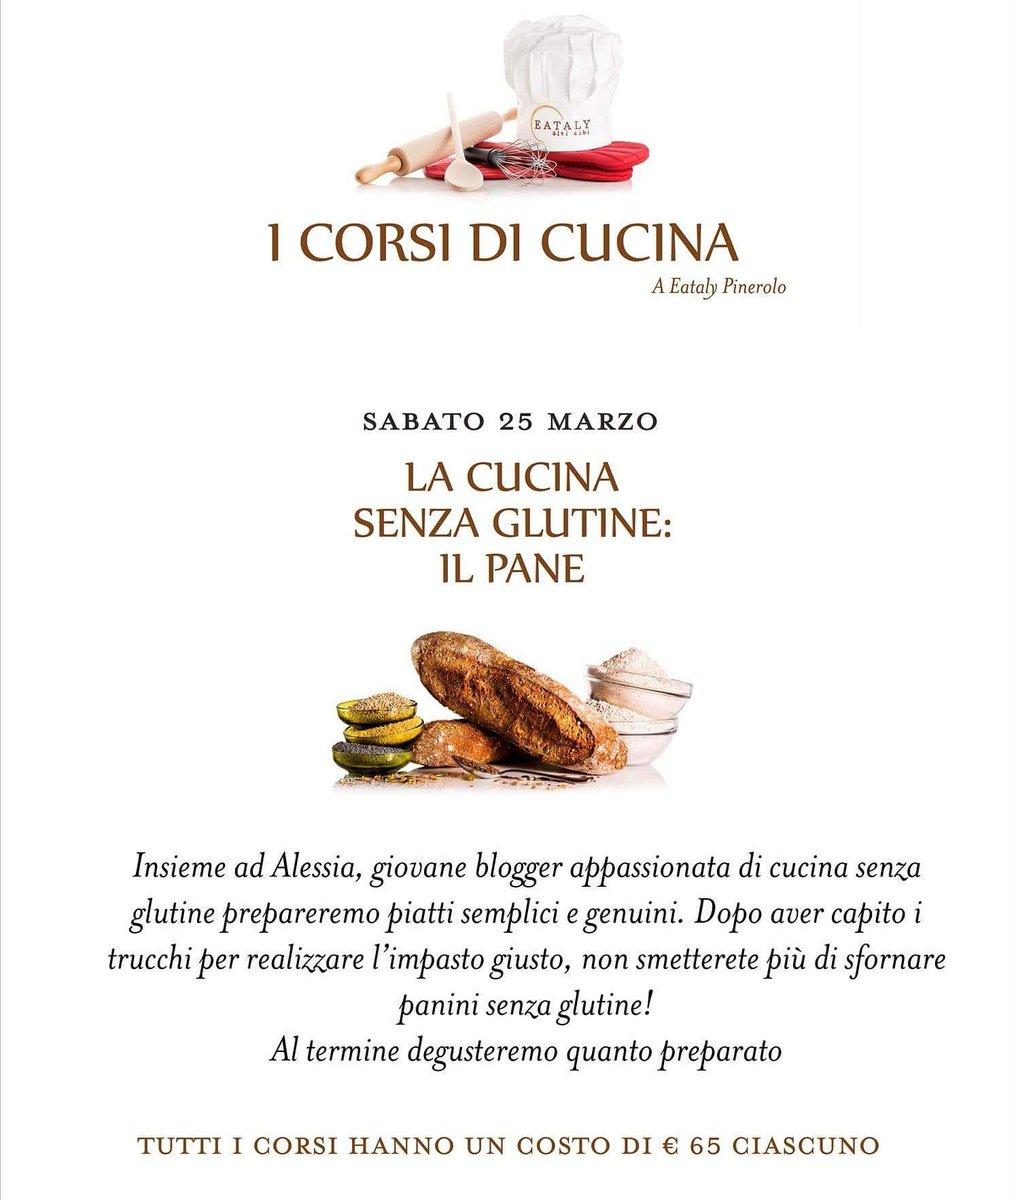 alessia ruzzier (@alessiaruzzier) | twitter - Corso Cucina Eataly